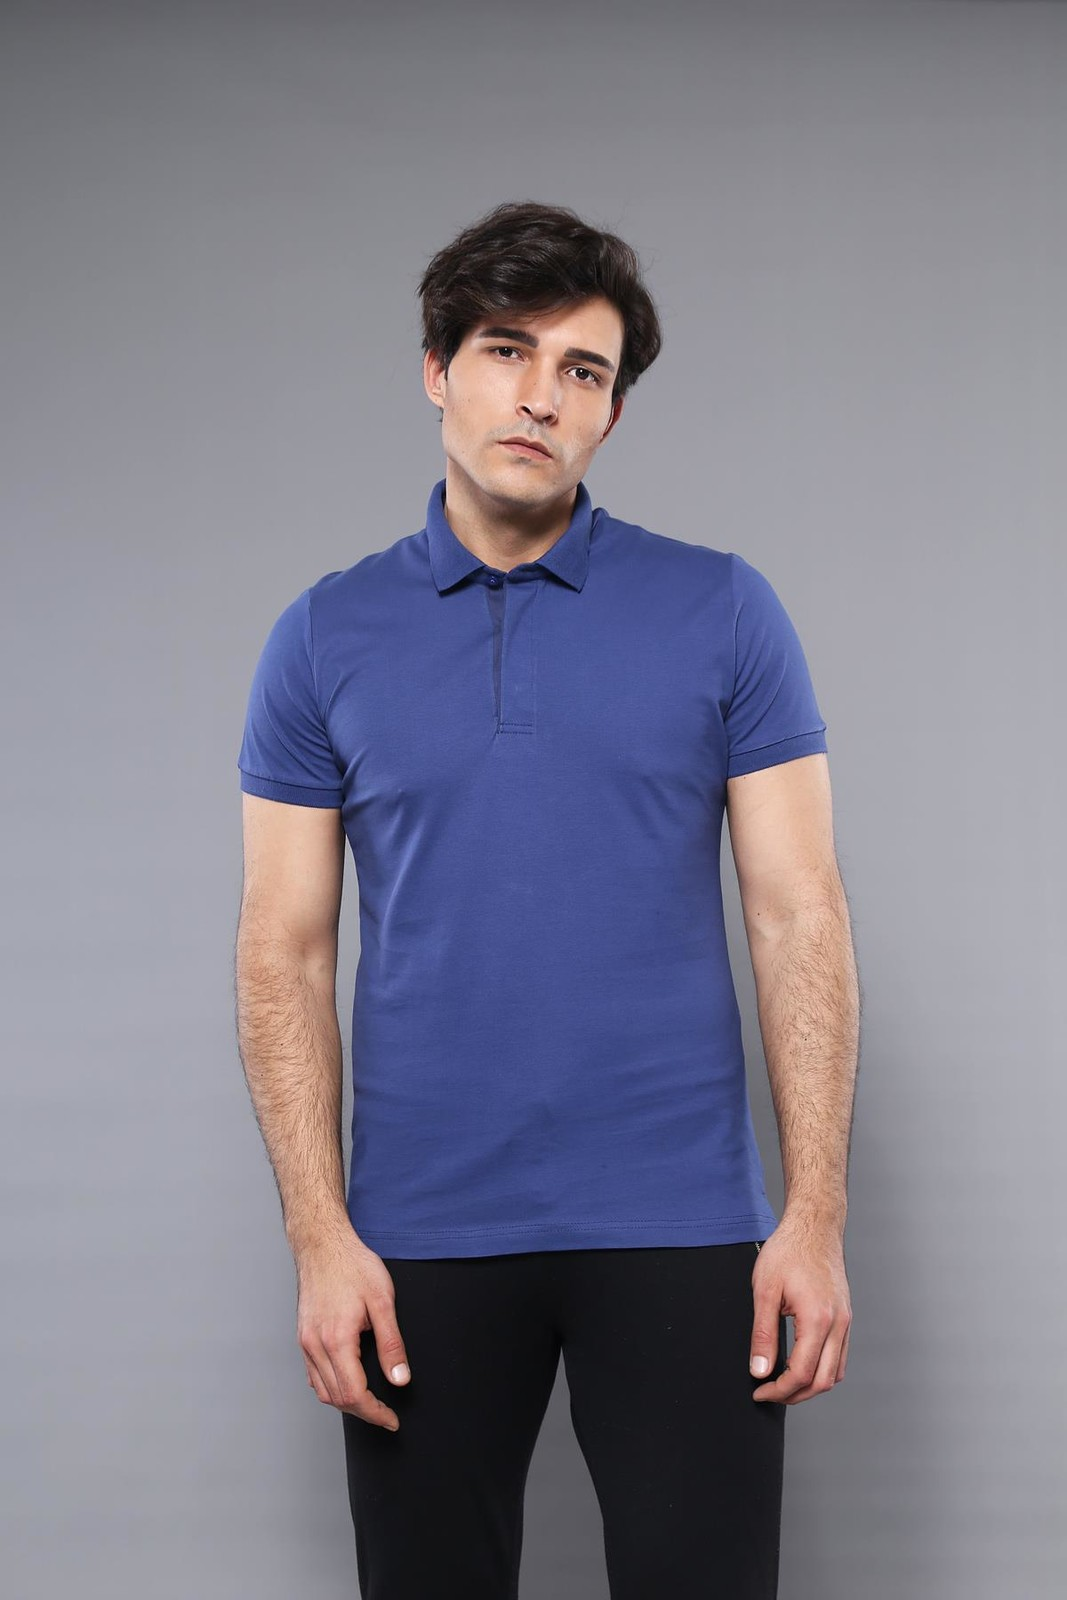 Men's Plain Dark Blue Polo T-shirt